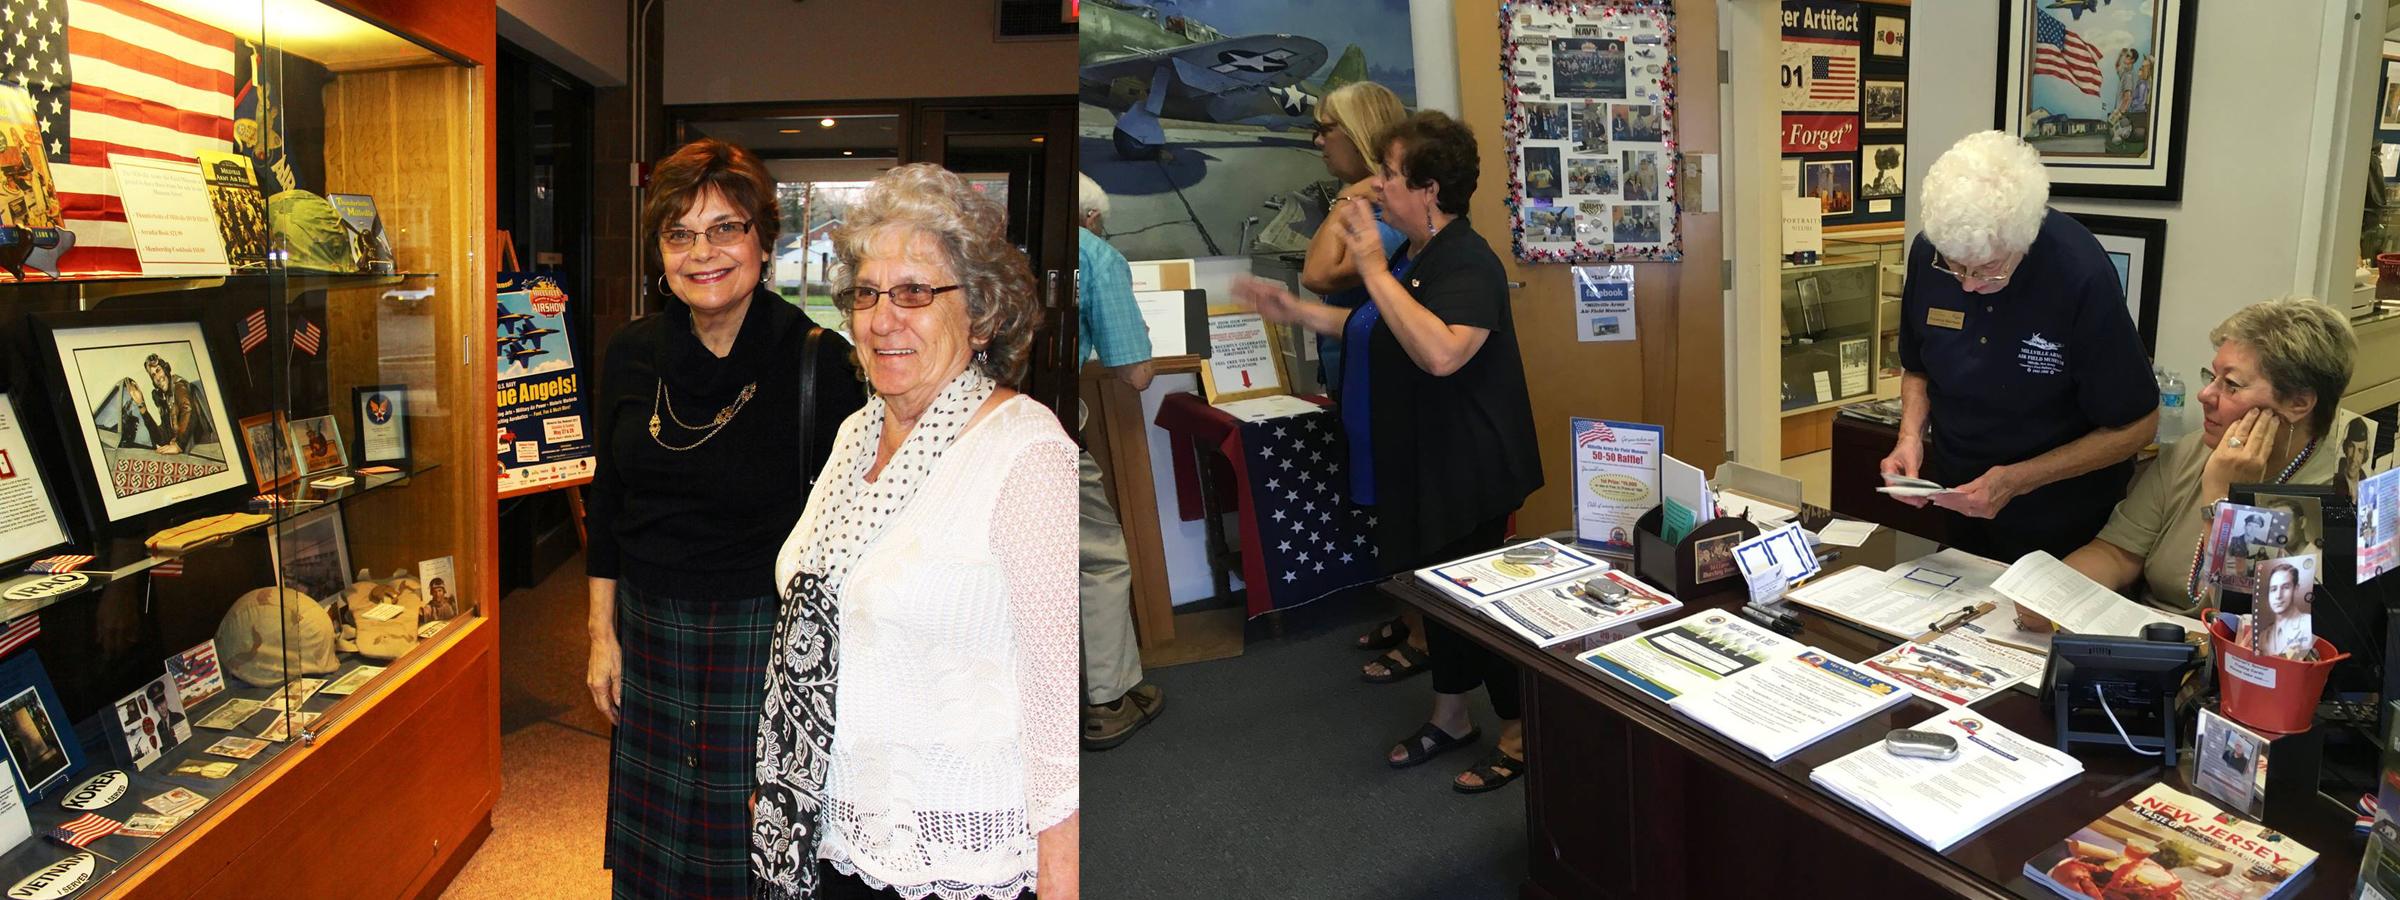 Millville Air Show Museum Staff